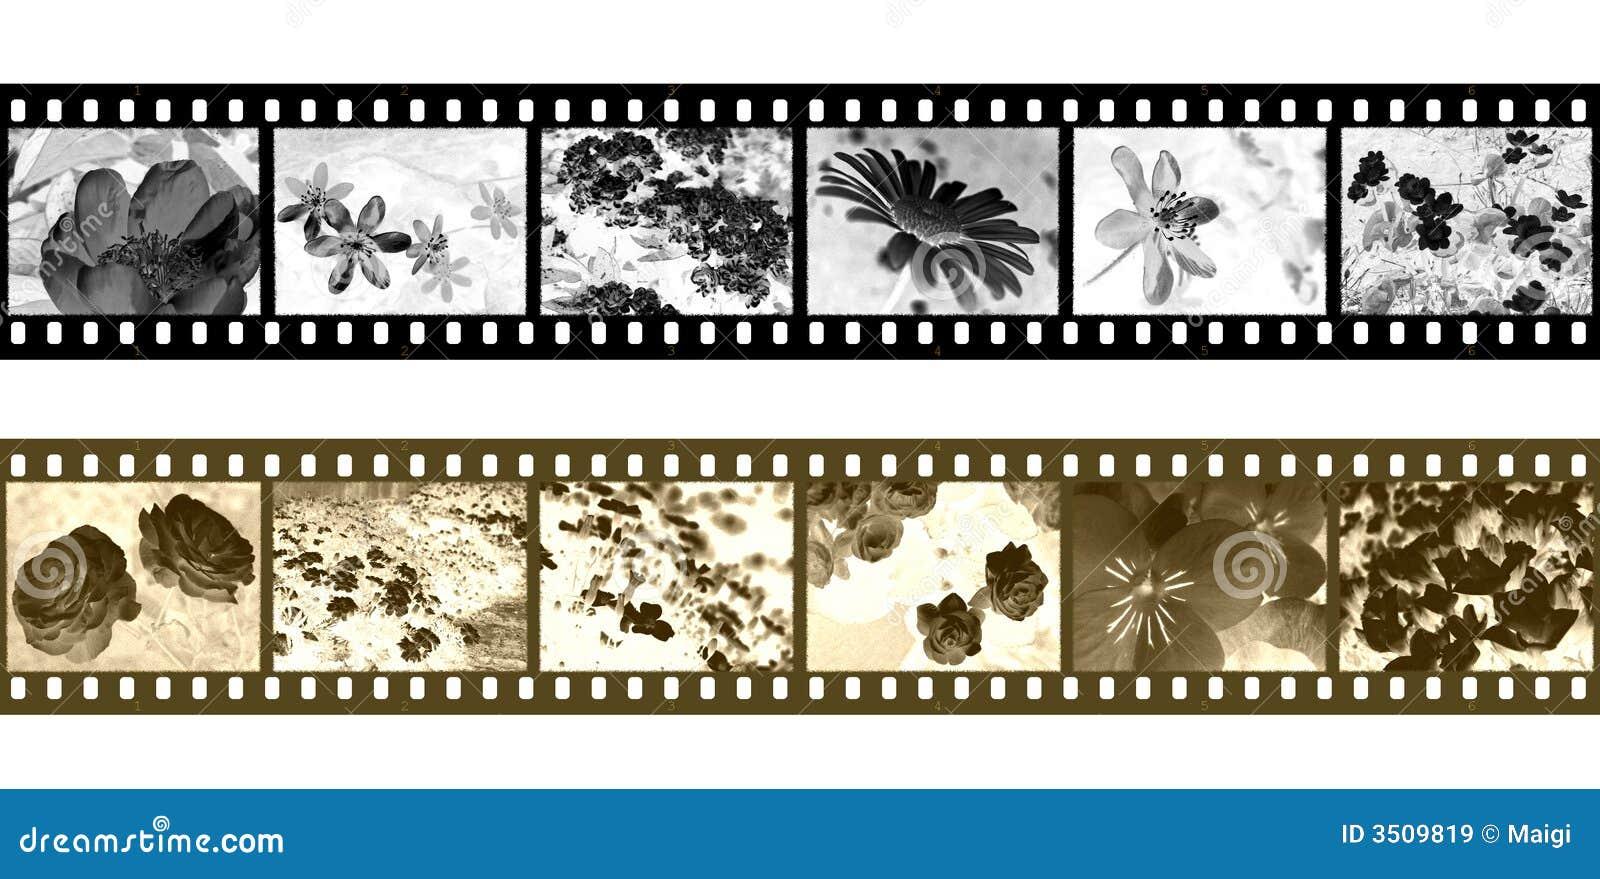 Filmstrip Negatives Royalty Free Stock Images - Image: 3509819